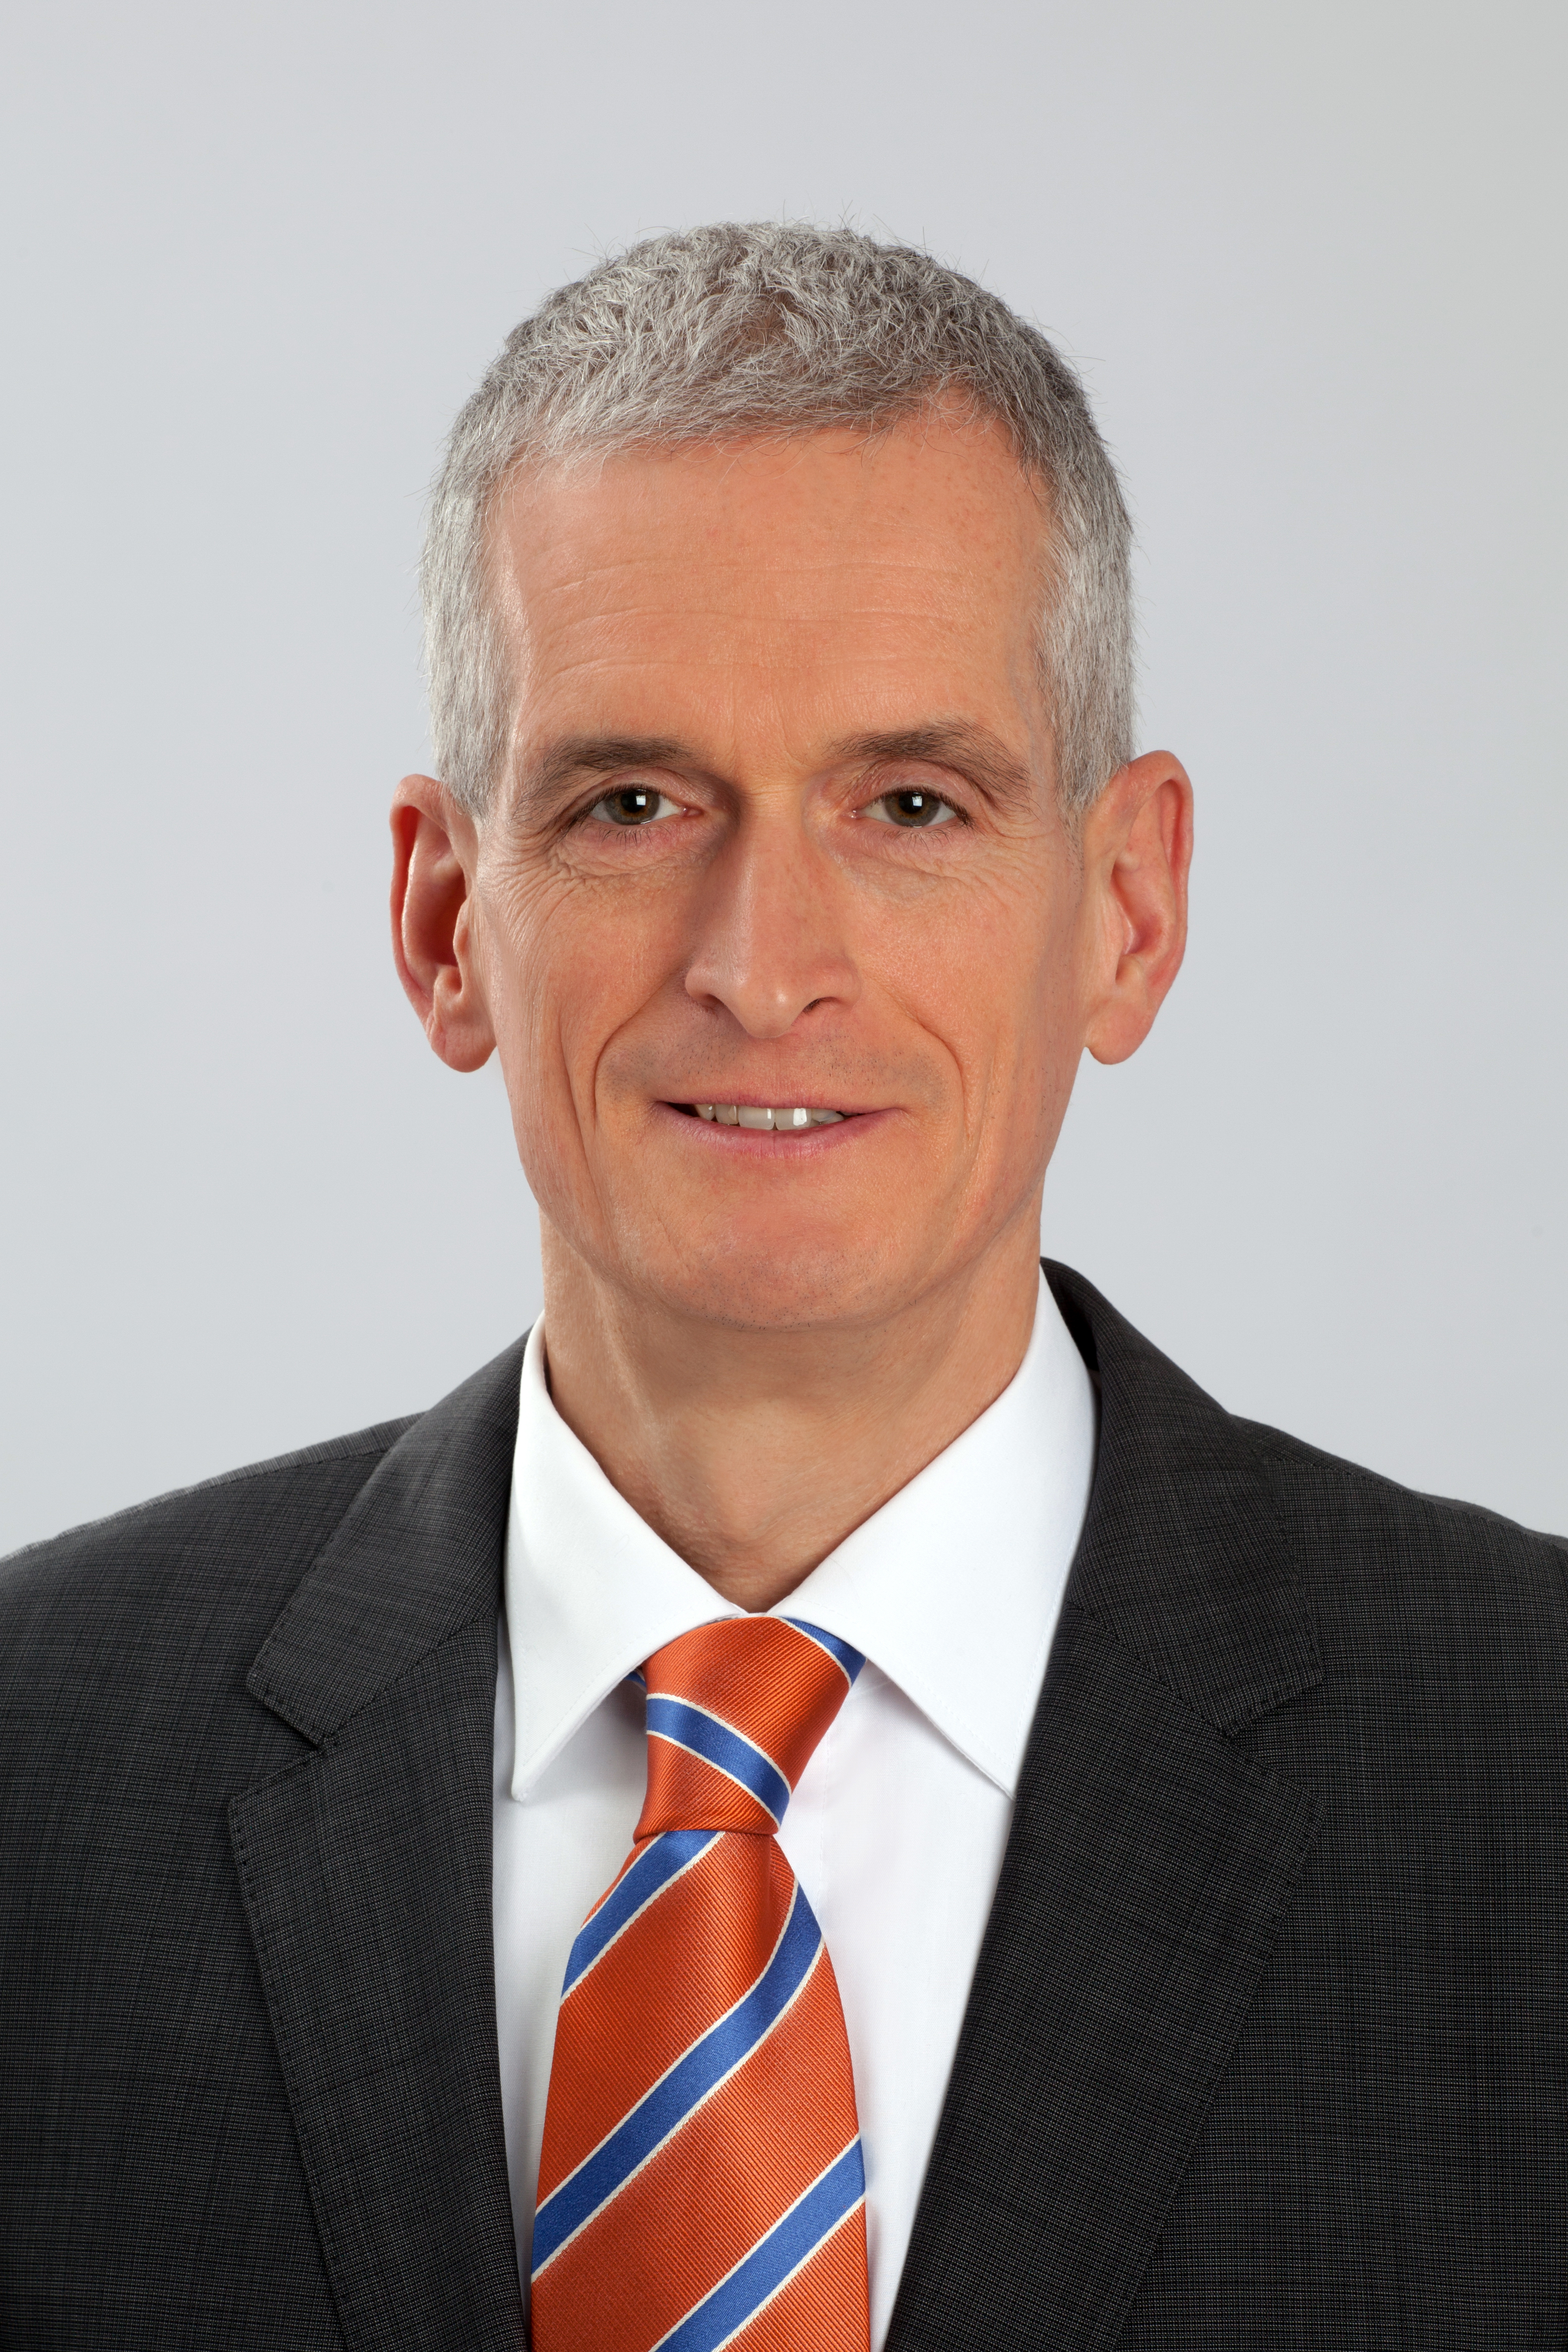 Frank Eschholz